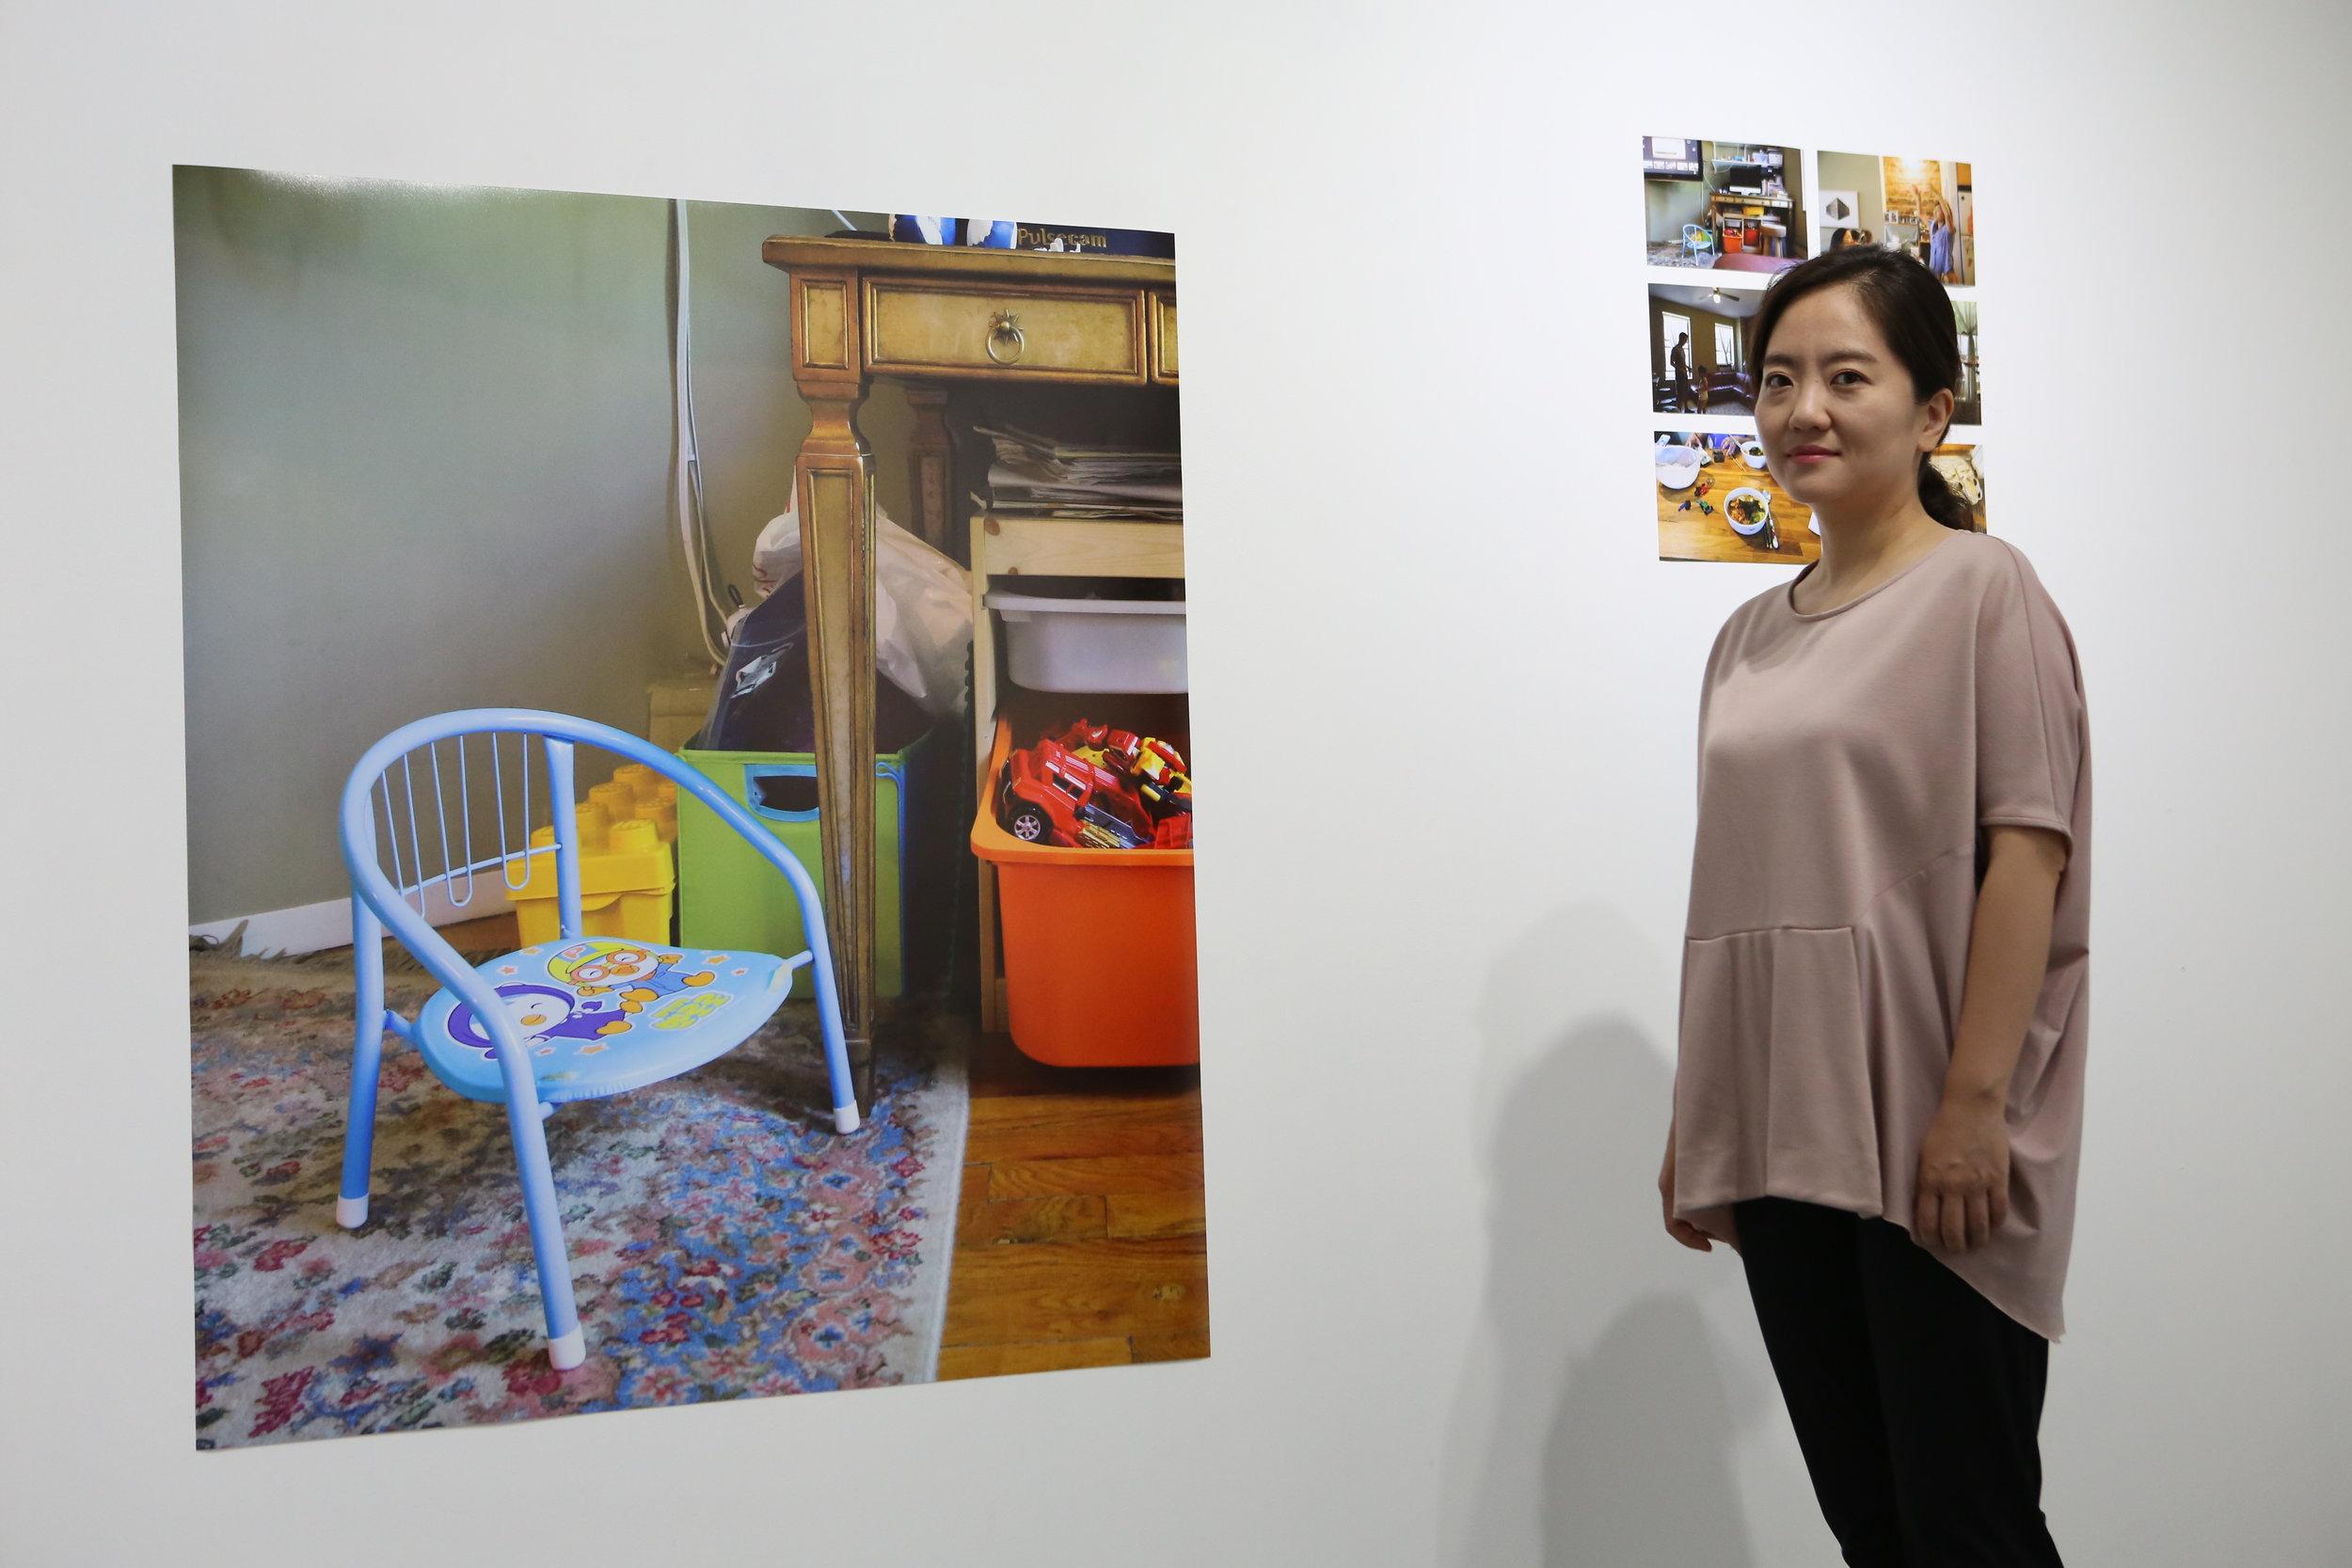 2017 residency program artist, Yujung Chang